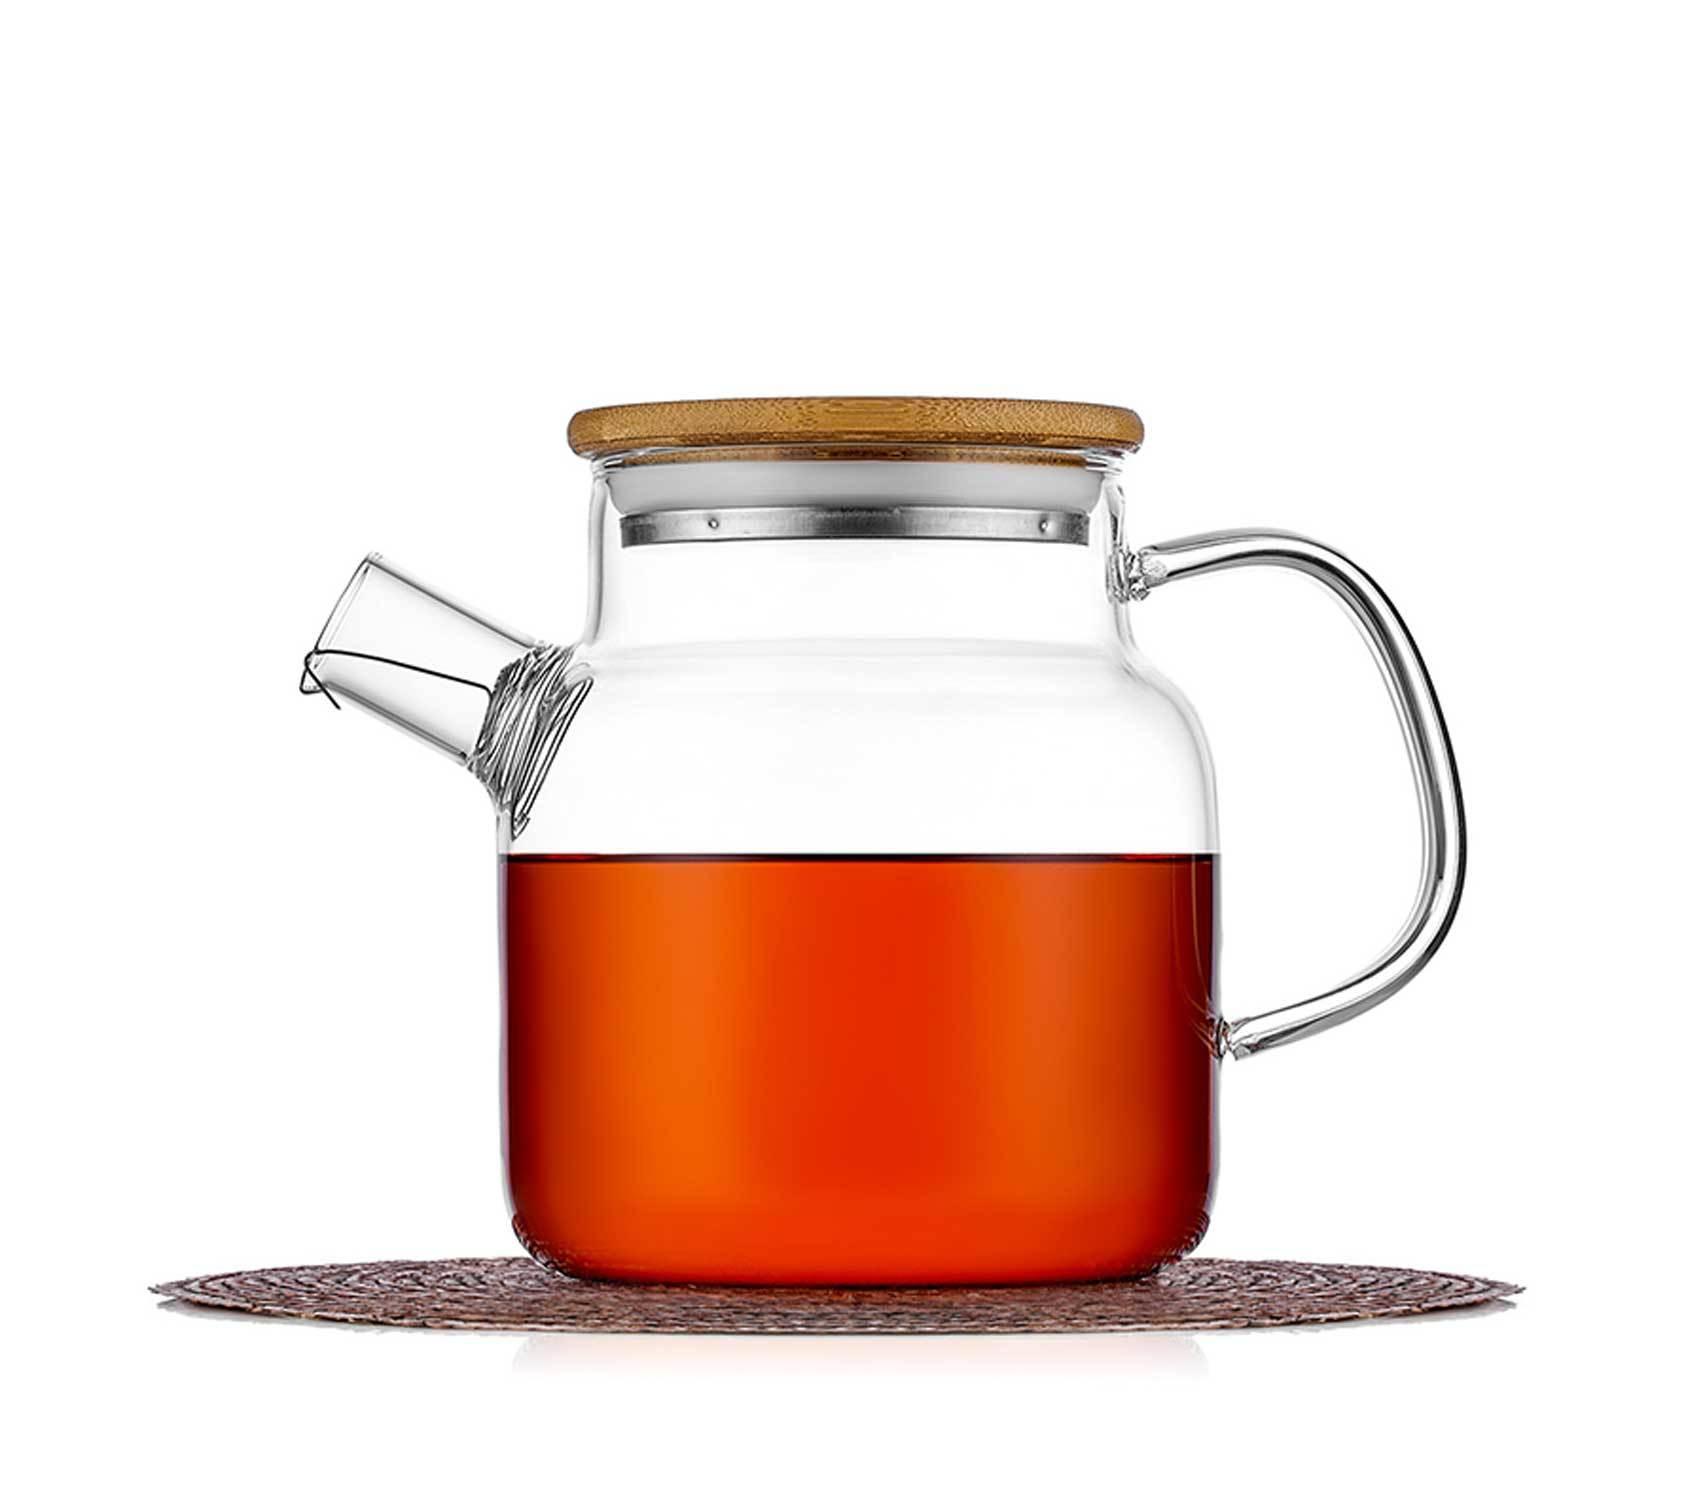 Чайники заварочные стеклянные Заварочный чайник с бамбуковой крышкой 550 мл chaynik_zavarochniy_bamboo_teastar-550ml.jpg